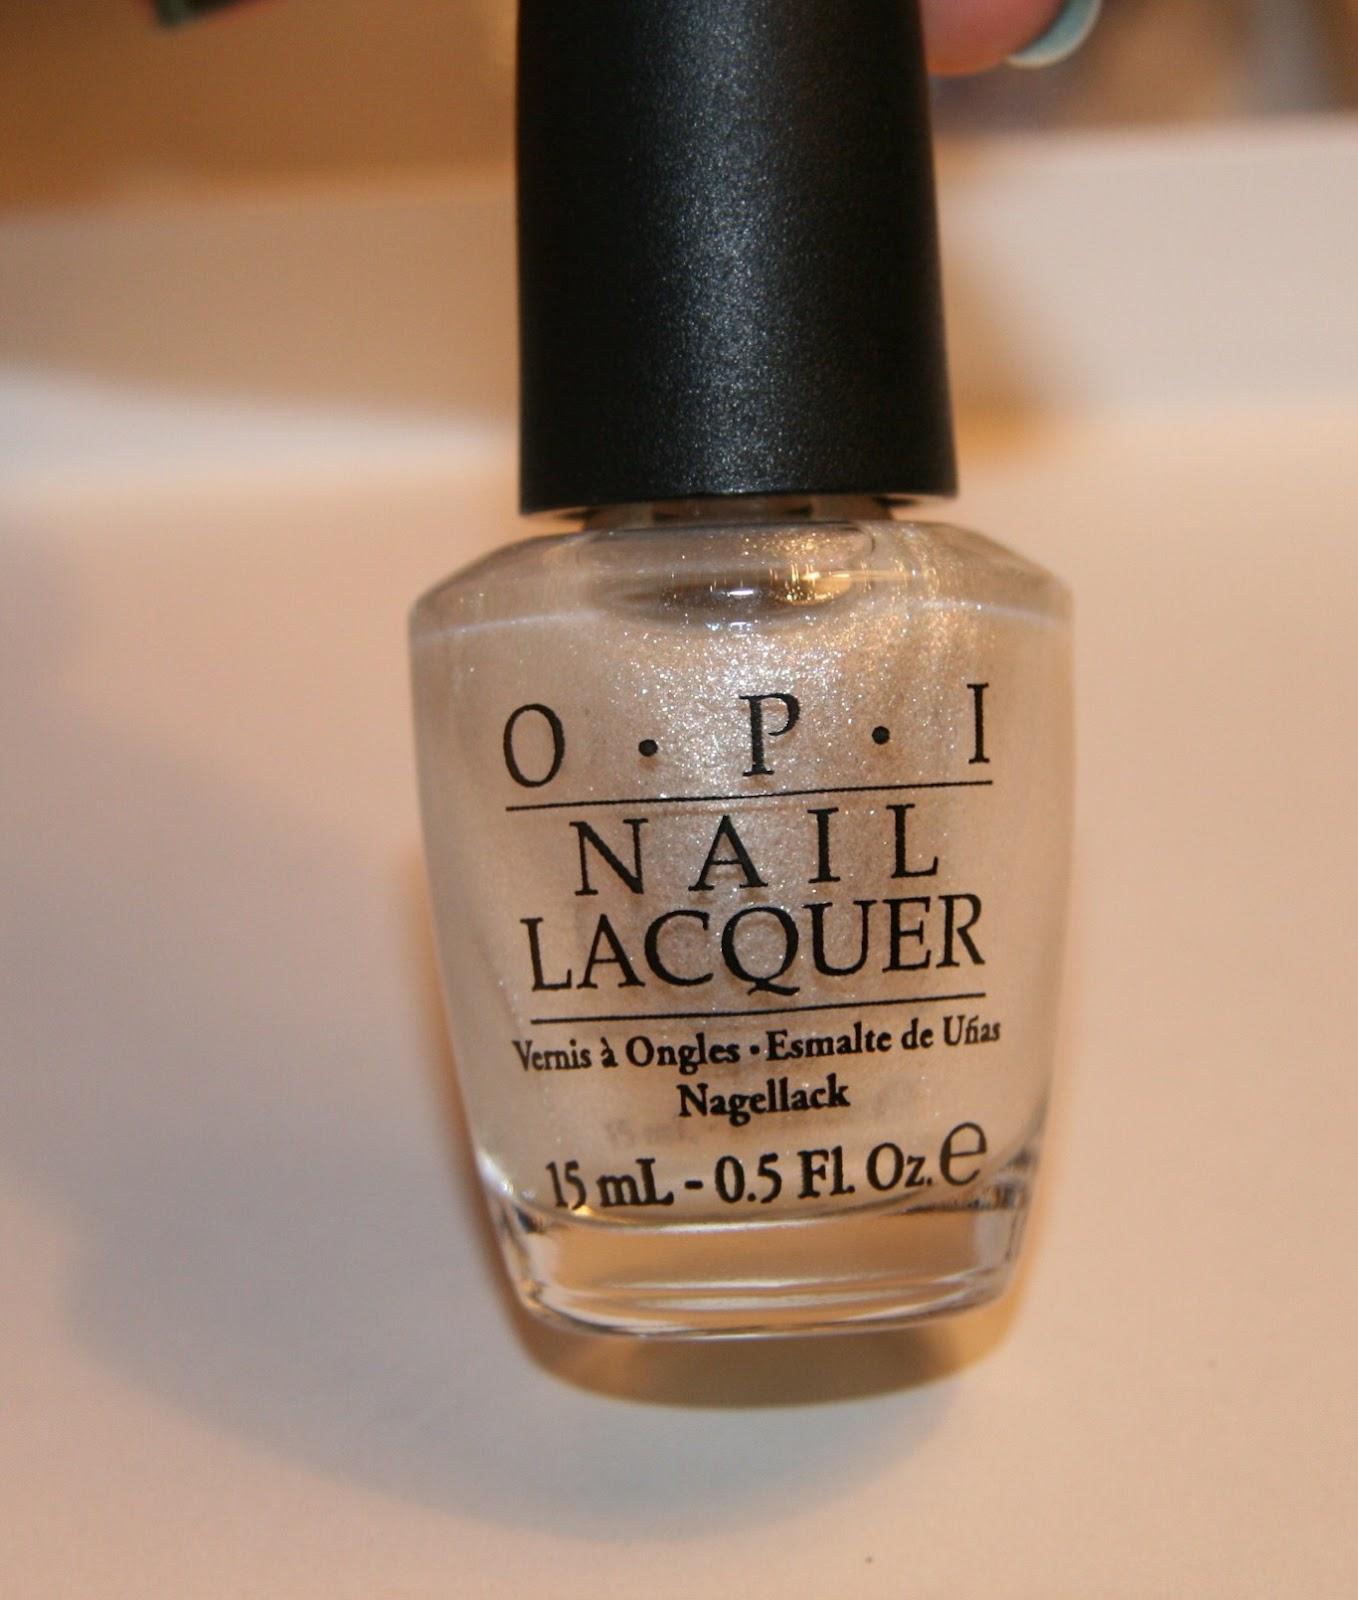 ElectroCat: Buyers Beware - Fake OPI nail polish!